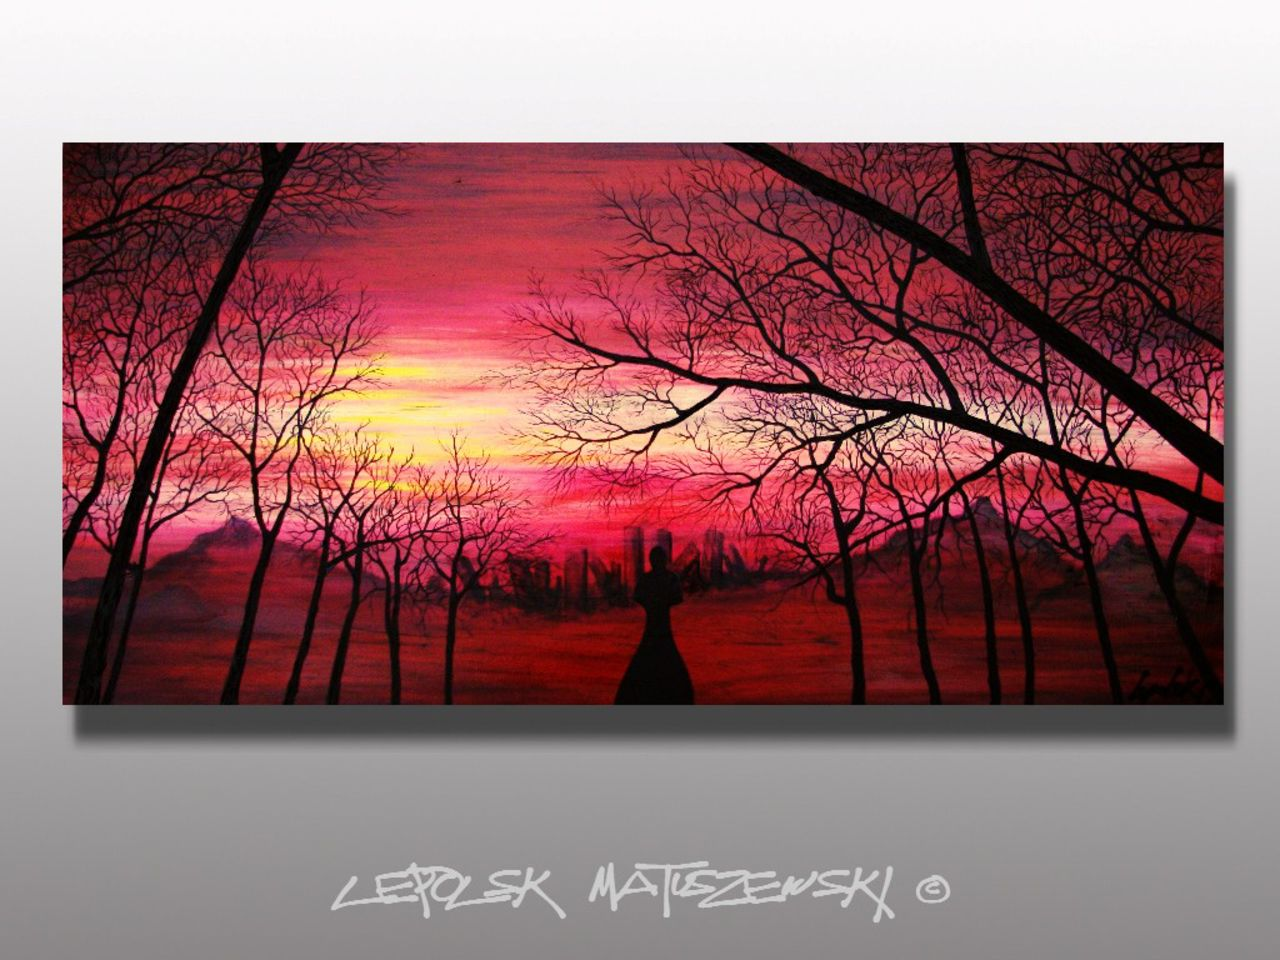 LEPOLSK MATUSZEWSKI EXCITATORIA LUMINA    art innabstrait Lepolsk Matuszewski